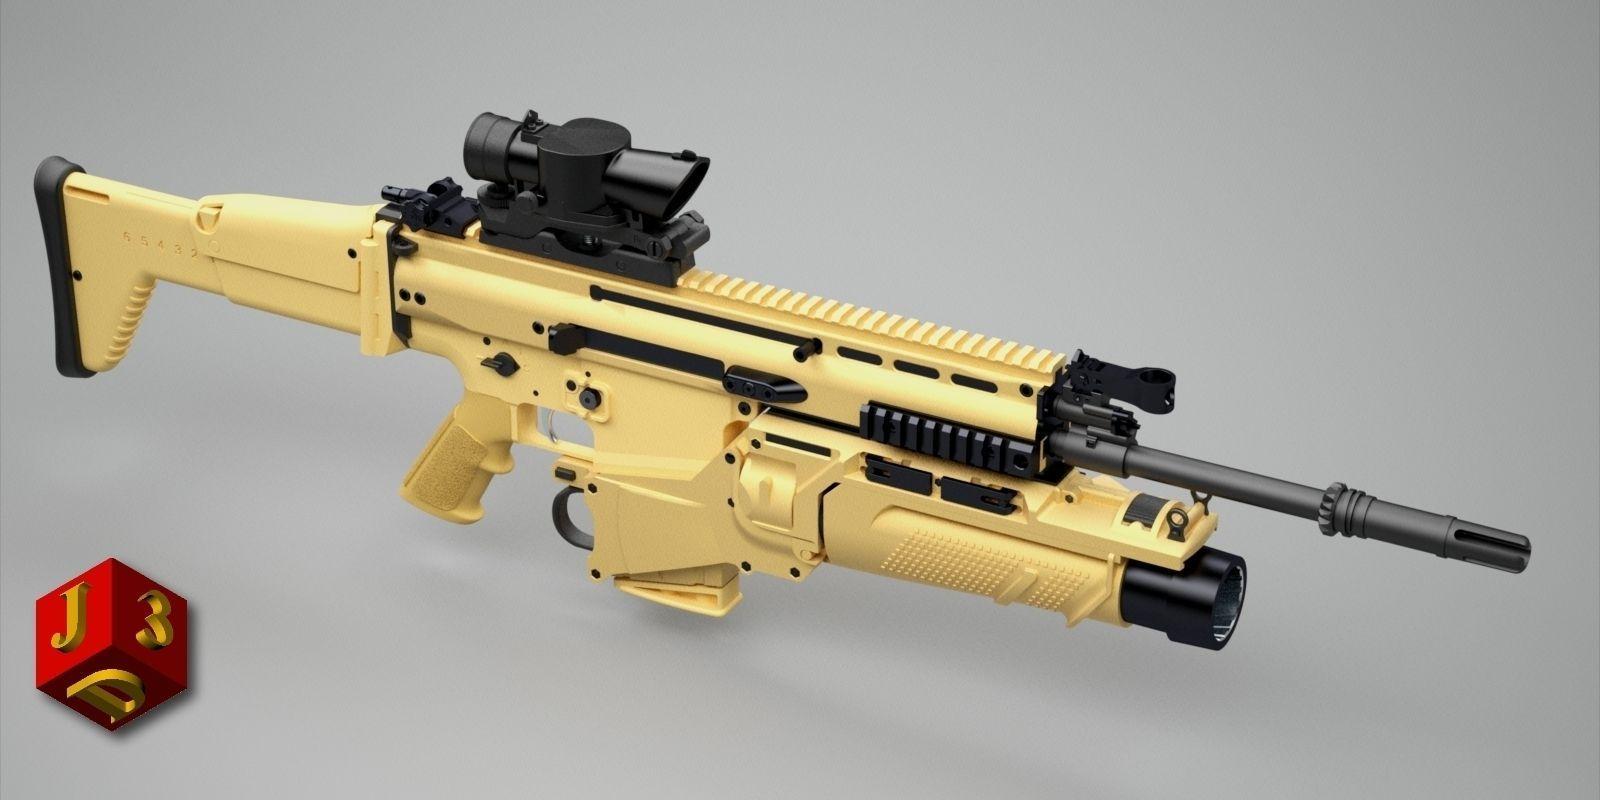 SCAR-H assault rifle | 3D model